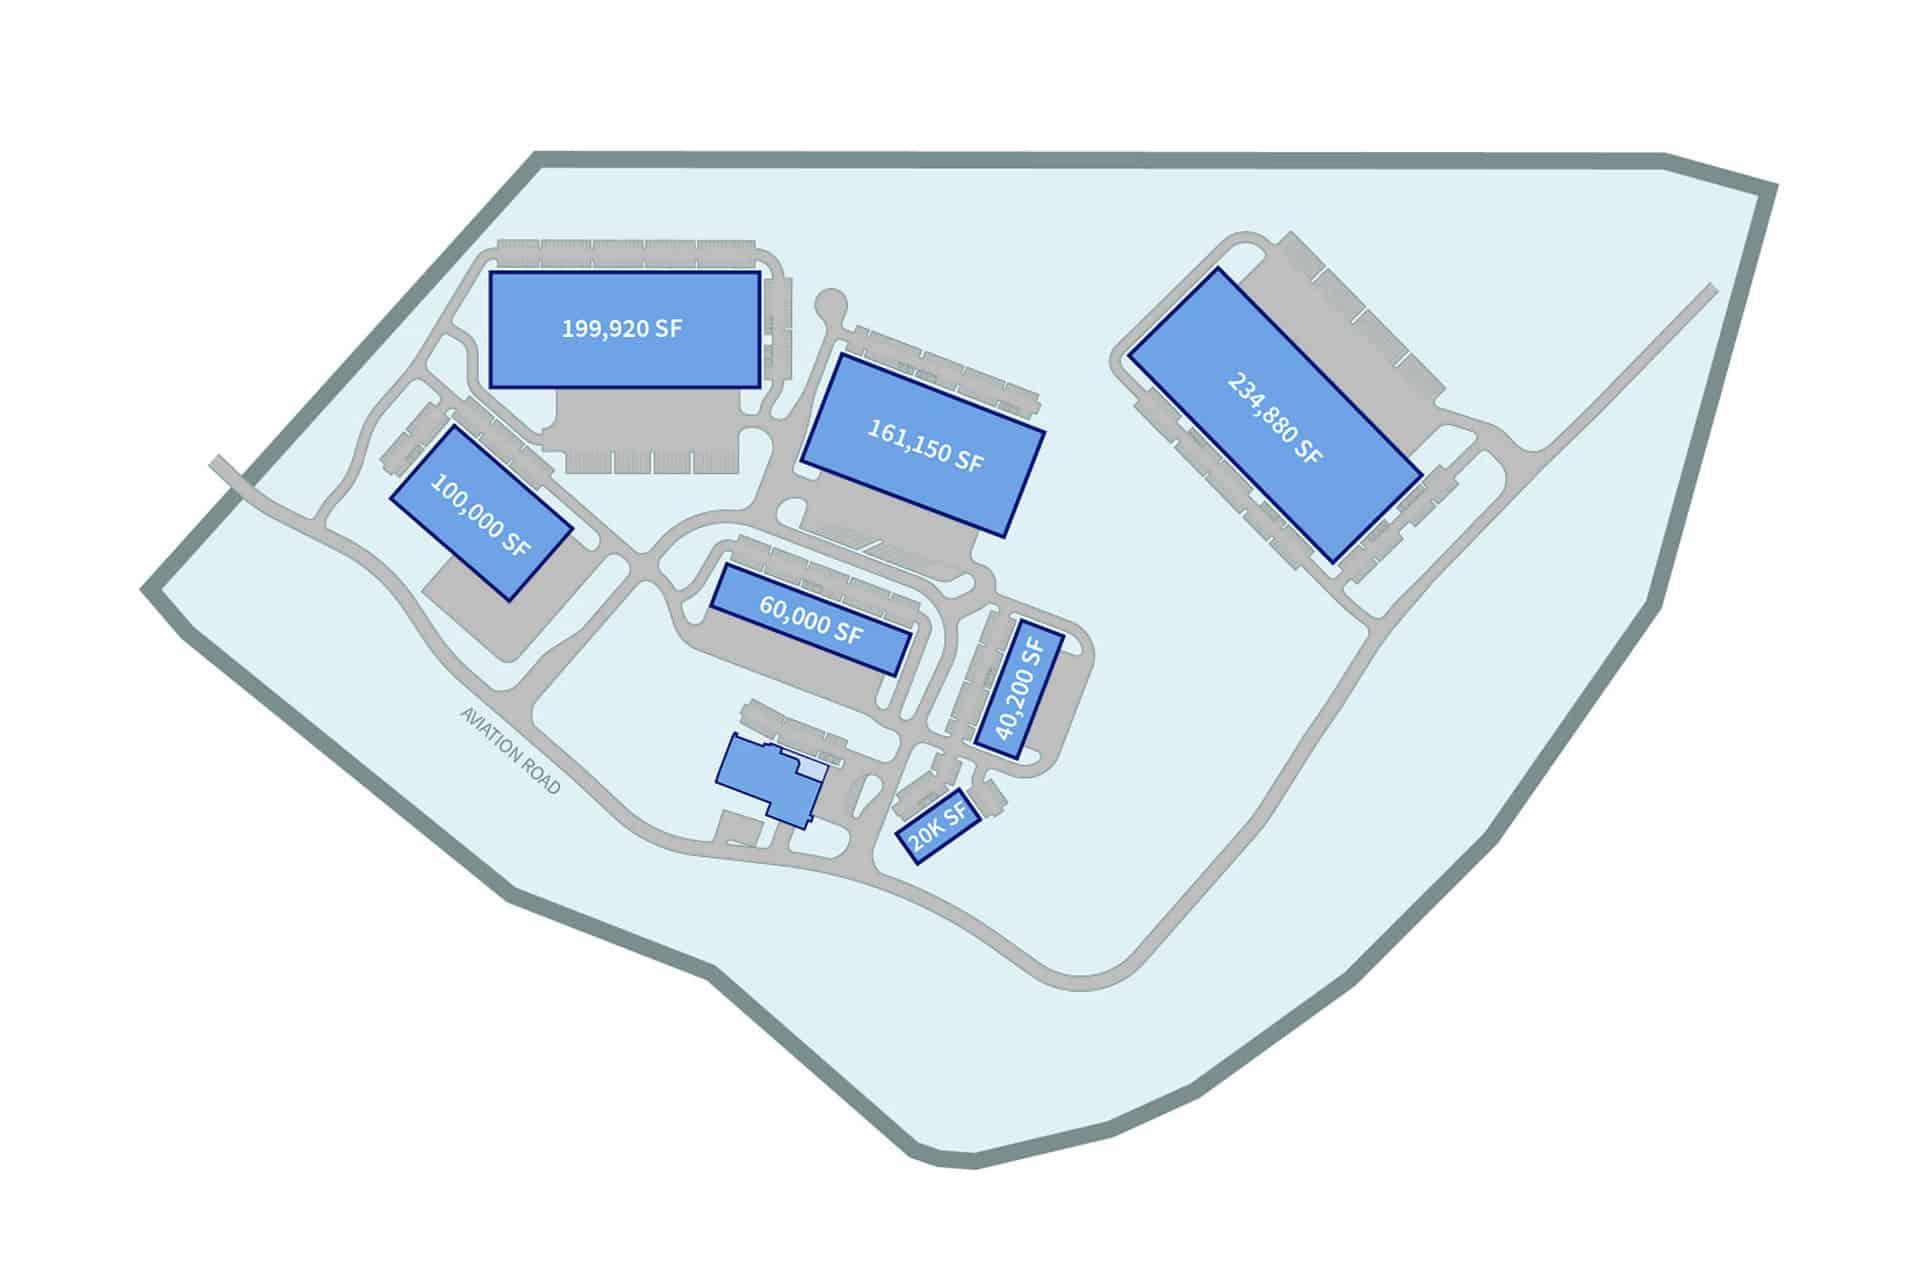 Berks Park 183 Plan